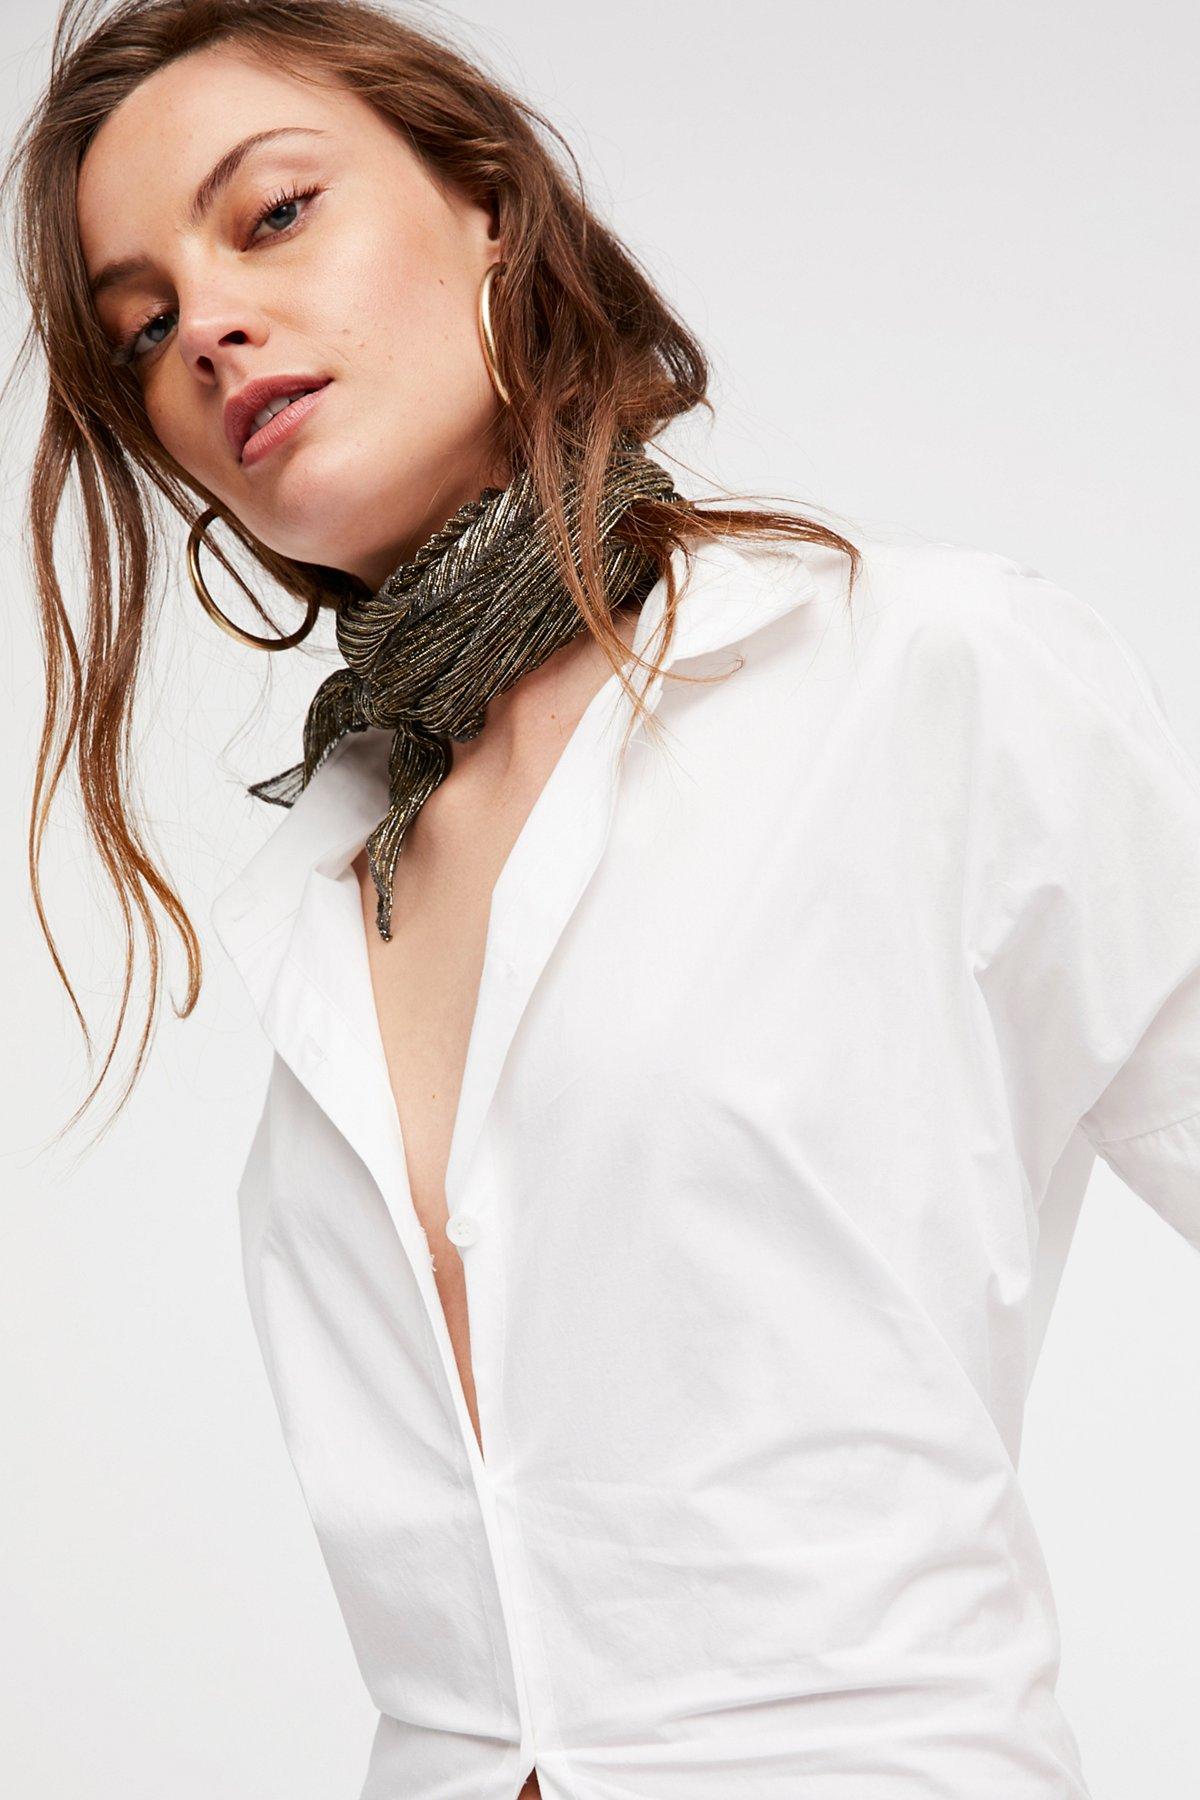 Roxy闪光褶皱围巾